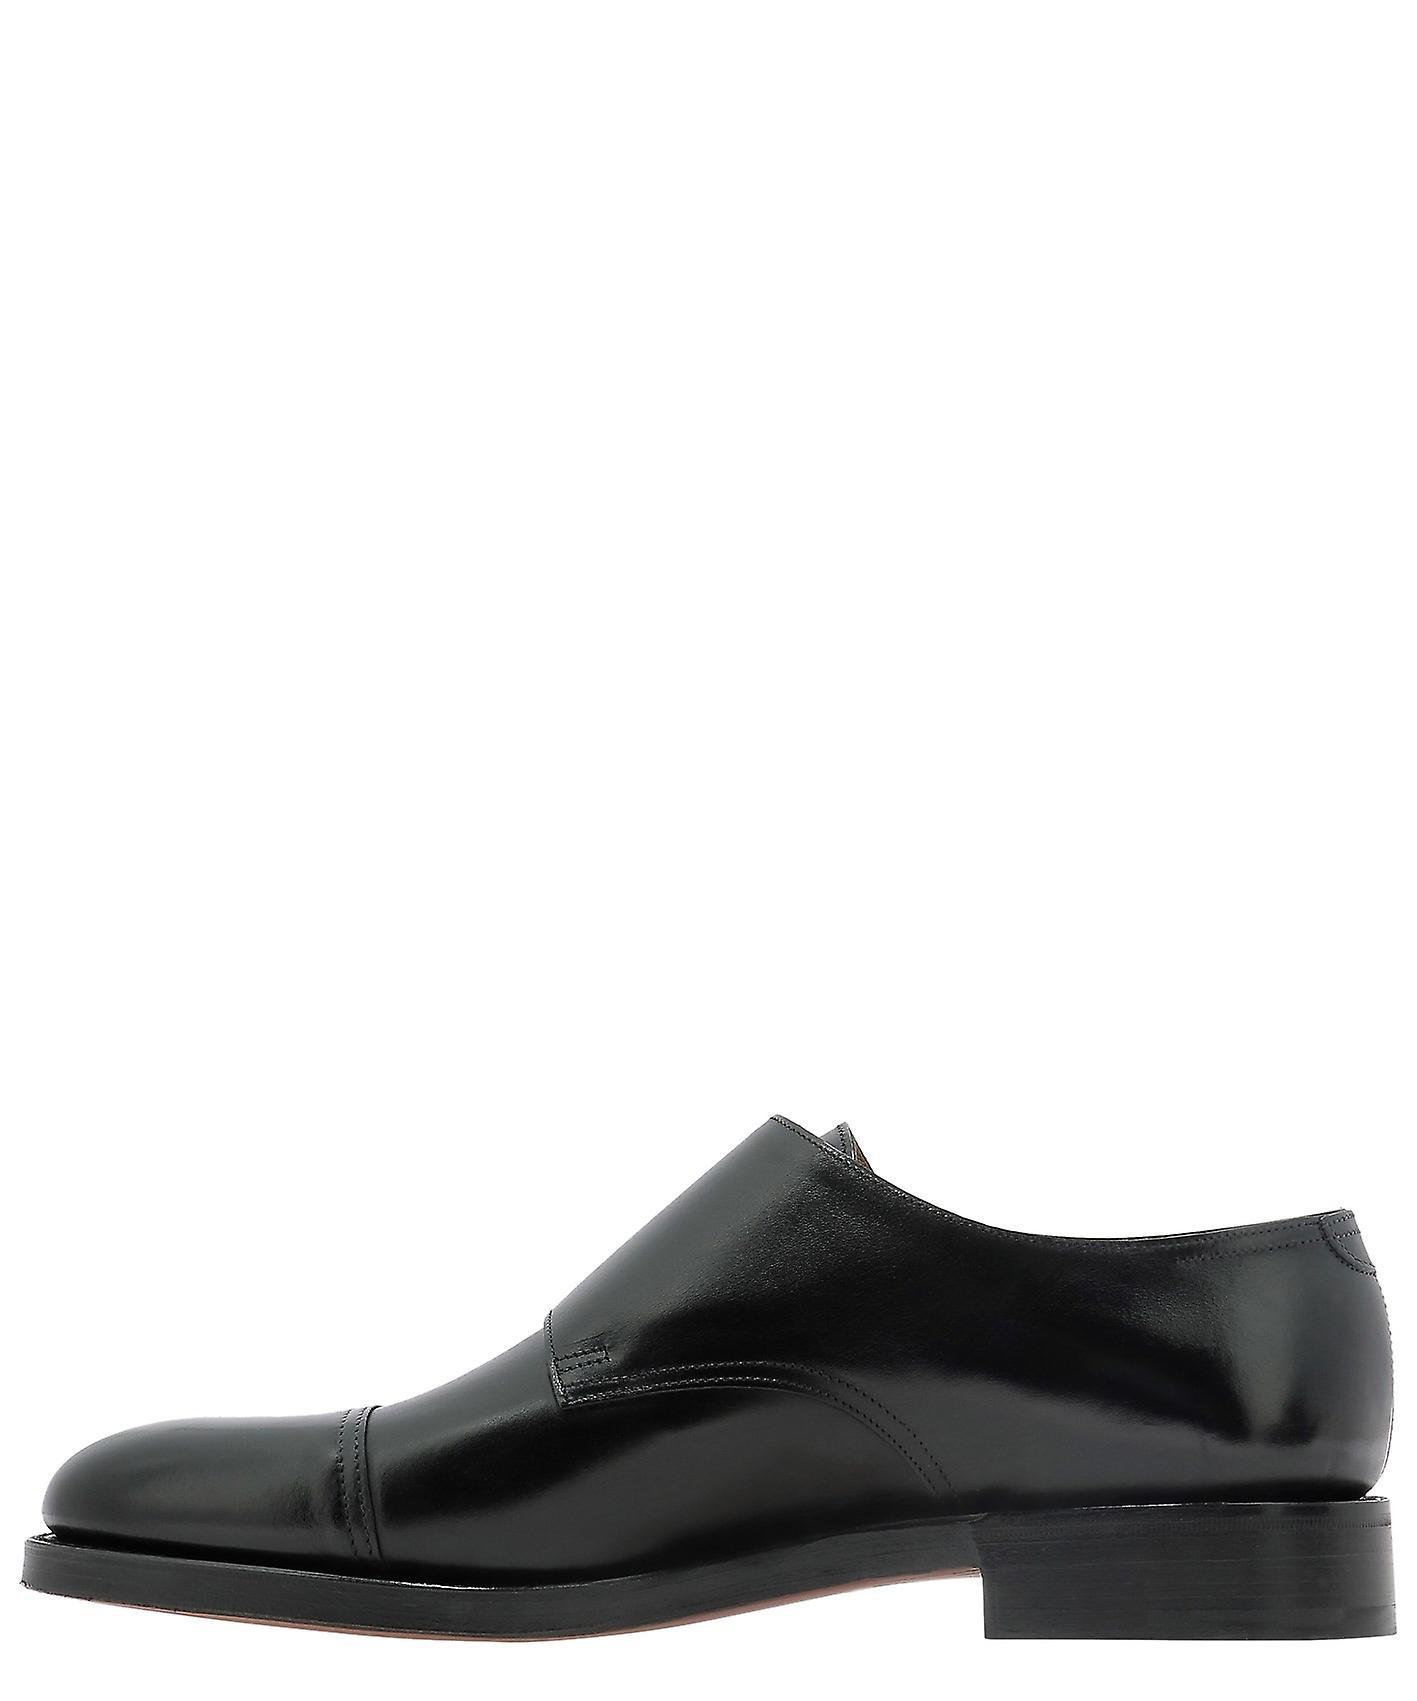 John Lobb 228032lblack1r Men's Black Leather Monk Strap Schoenen - Gratis verzending z2U5EM